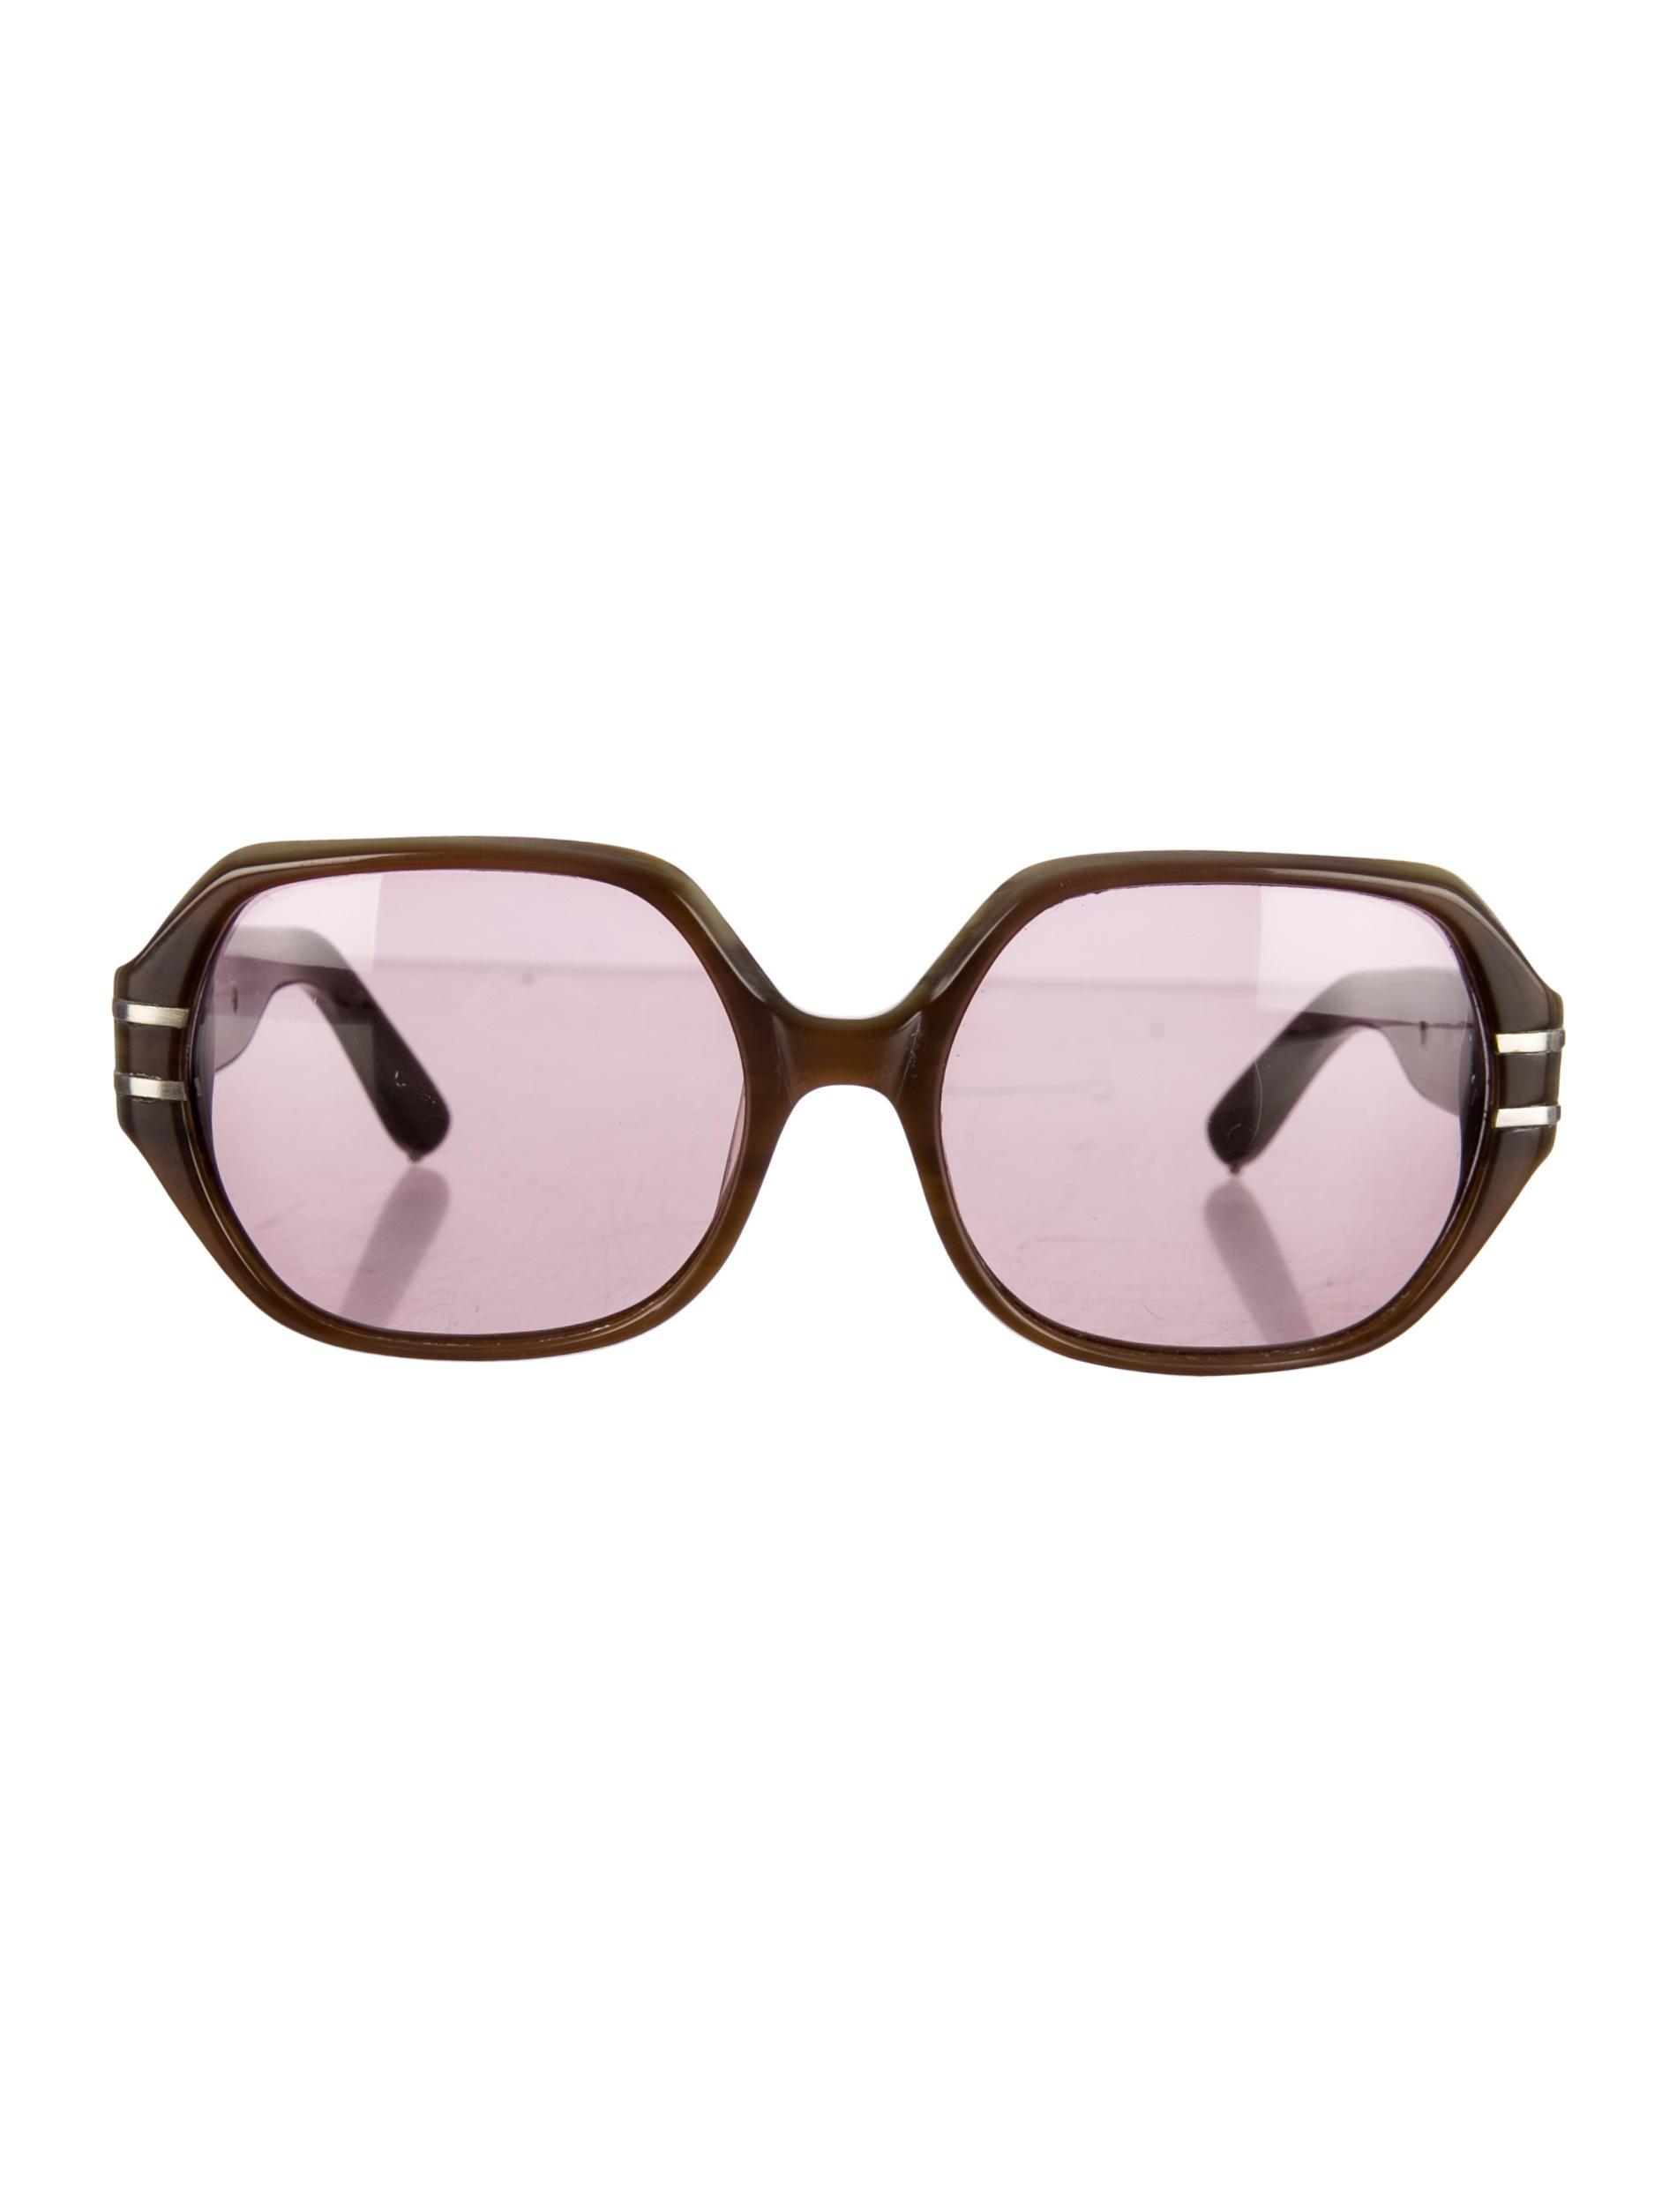 c2acdfb05b4b Chloe Sunglasses For Women